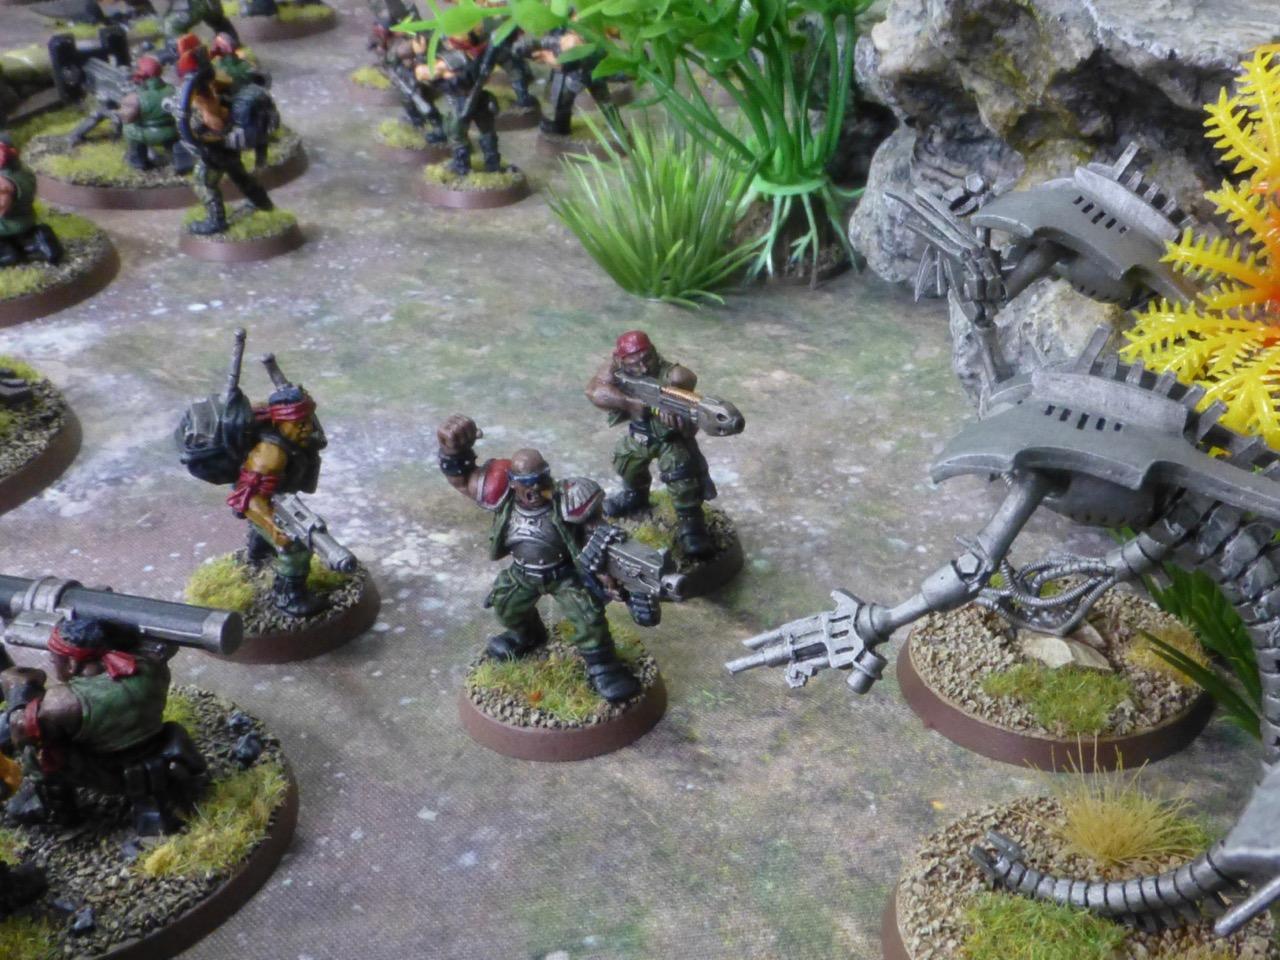 Battle scene between Necrons and Catachan Jungle Fighters